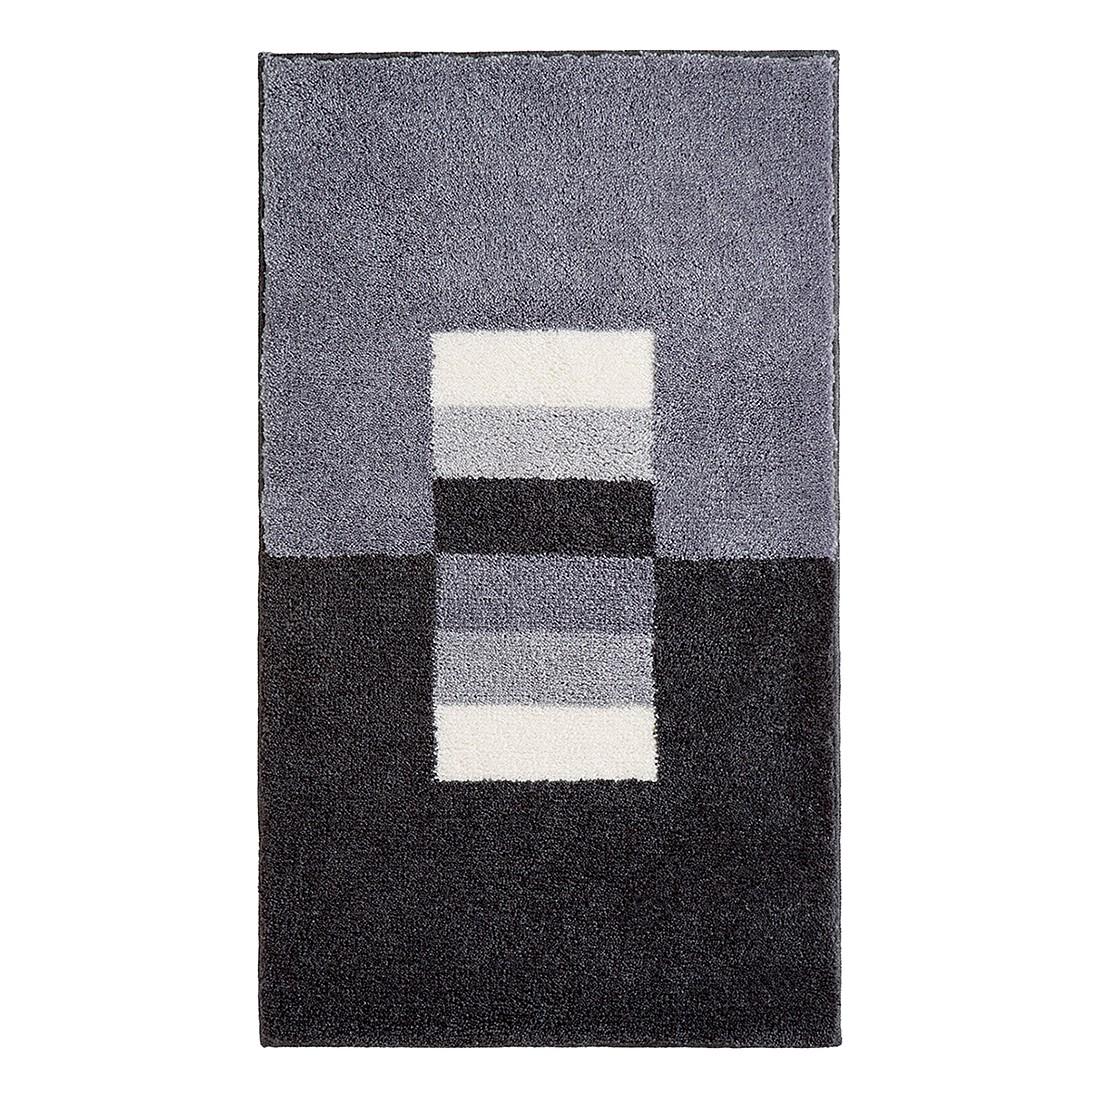 badteppich capri grau gr e 60 x 90 cm grund g nstig kaufen. Black Bedroom Furniture Sets. Home Design Ideas